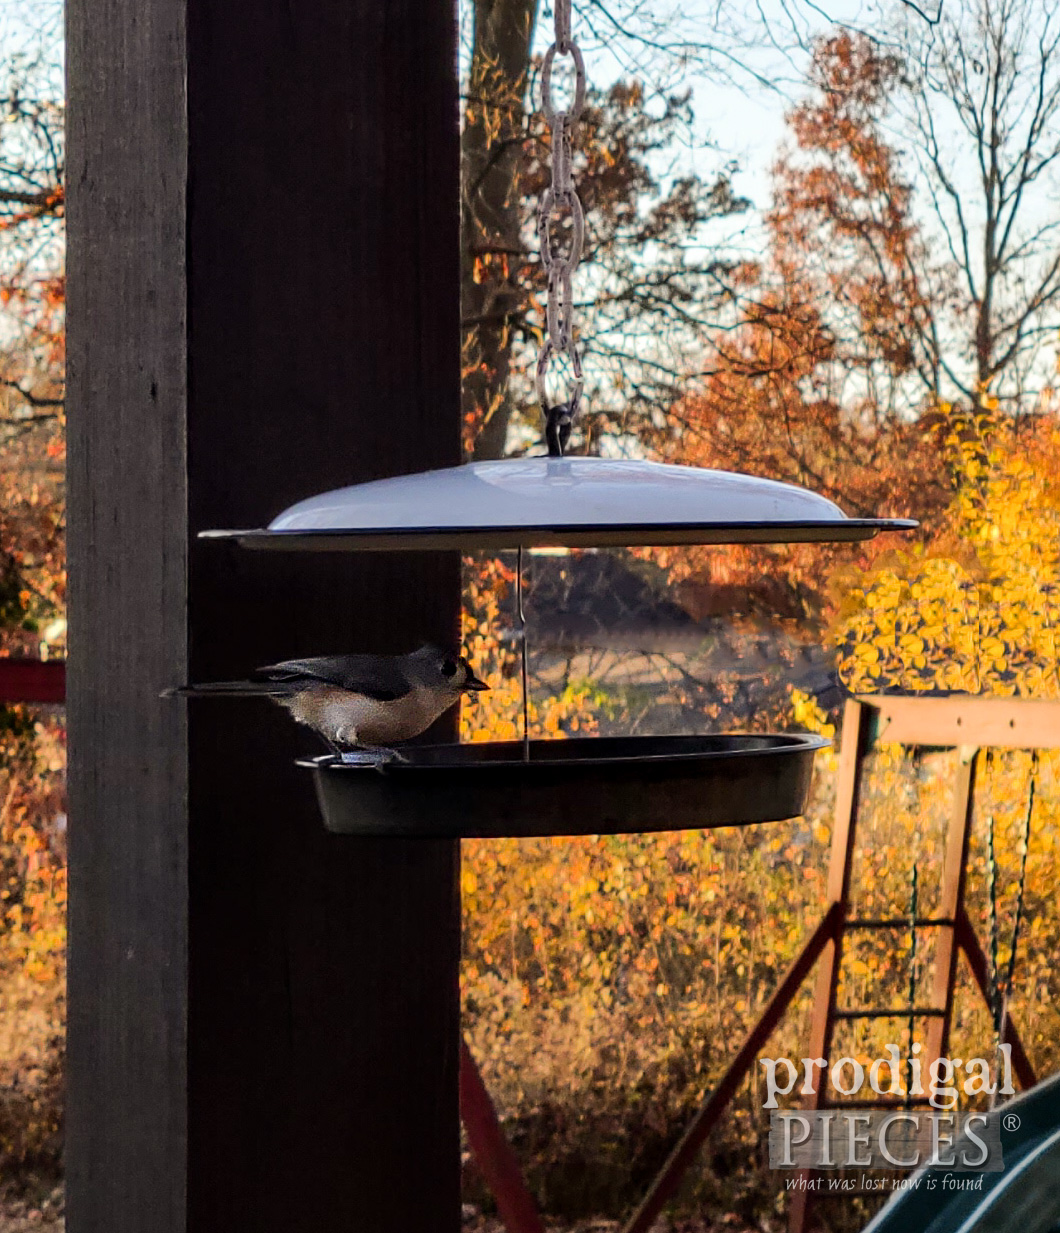 Nuthatch Bird Feeding at Repurposed Bird Feeder by Larissa of Prodigal Pieces | prodigalpieces.com #prodigalpieces #garden #home #homedecor